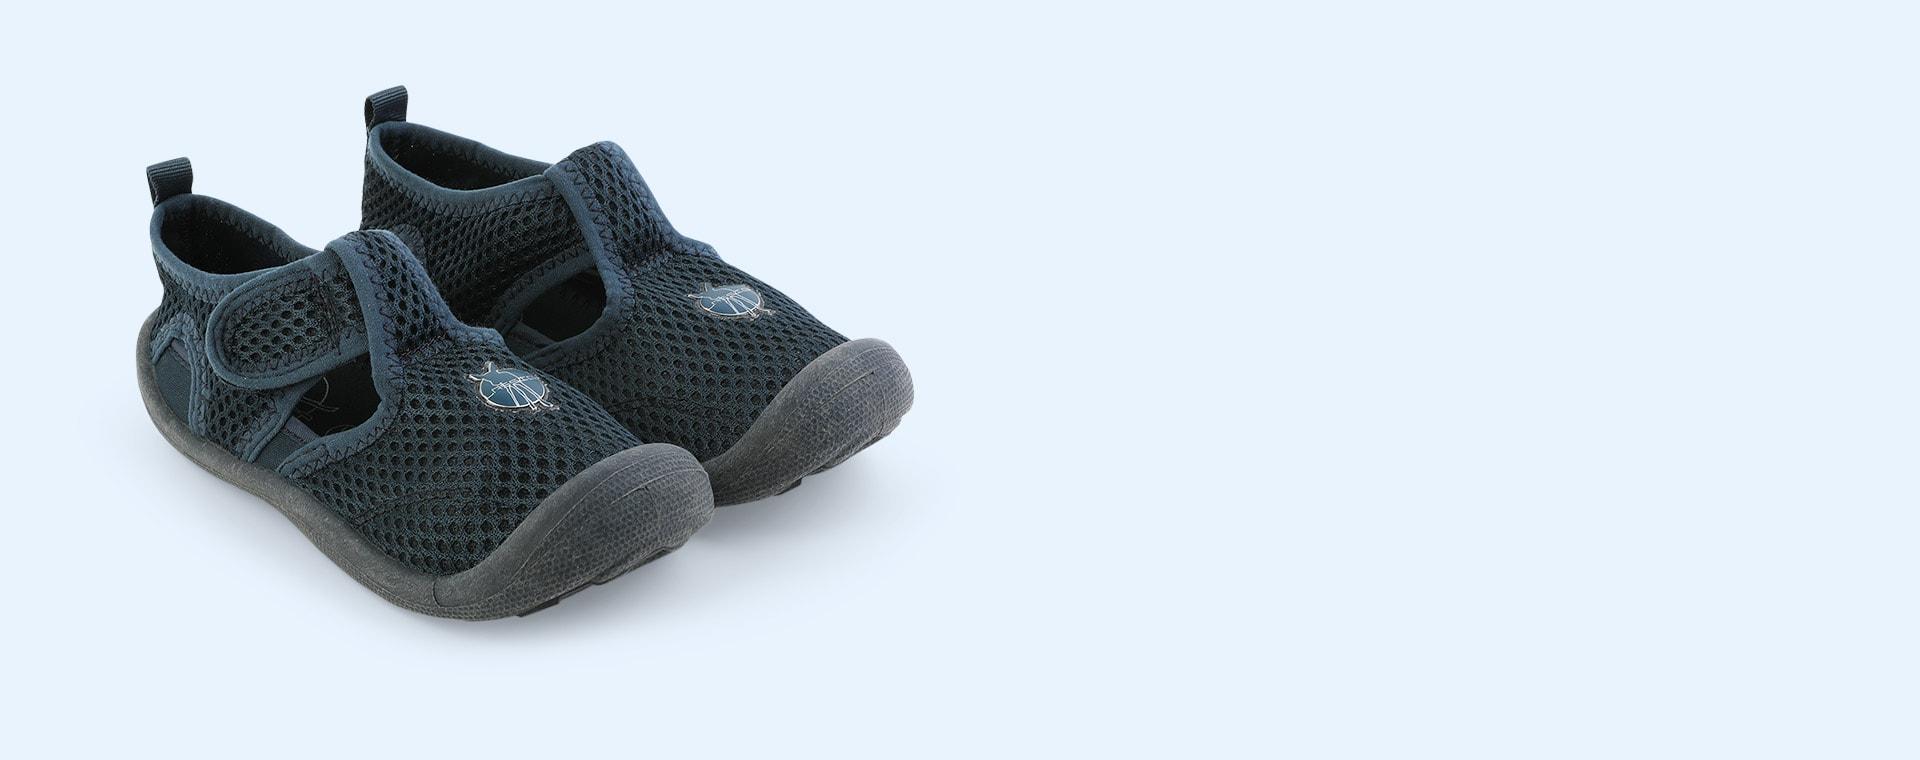 Blue Lassig Beach Sandals